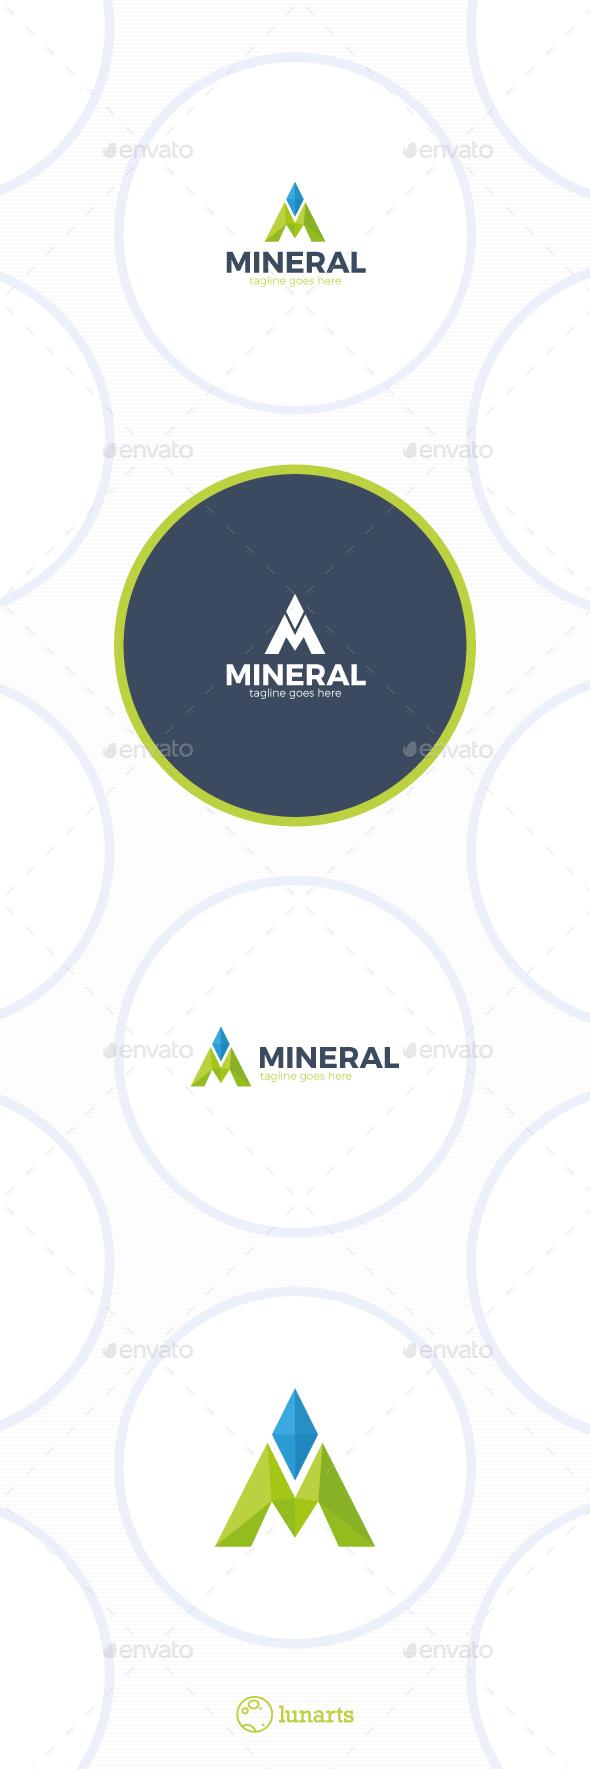 Mineral Logo - Letter M